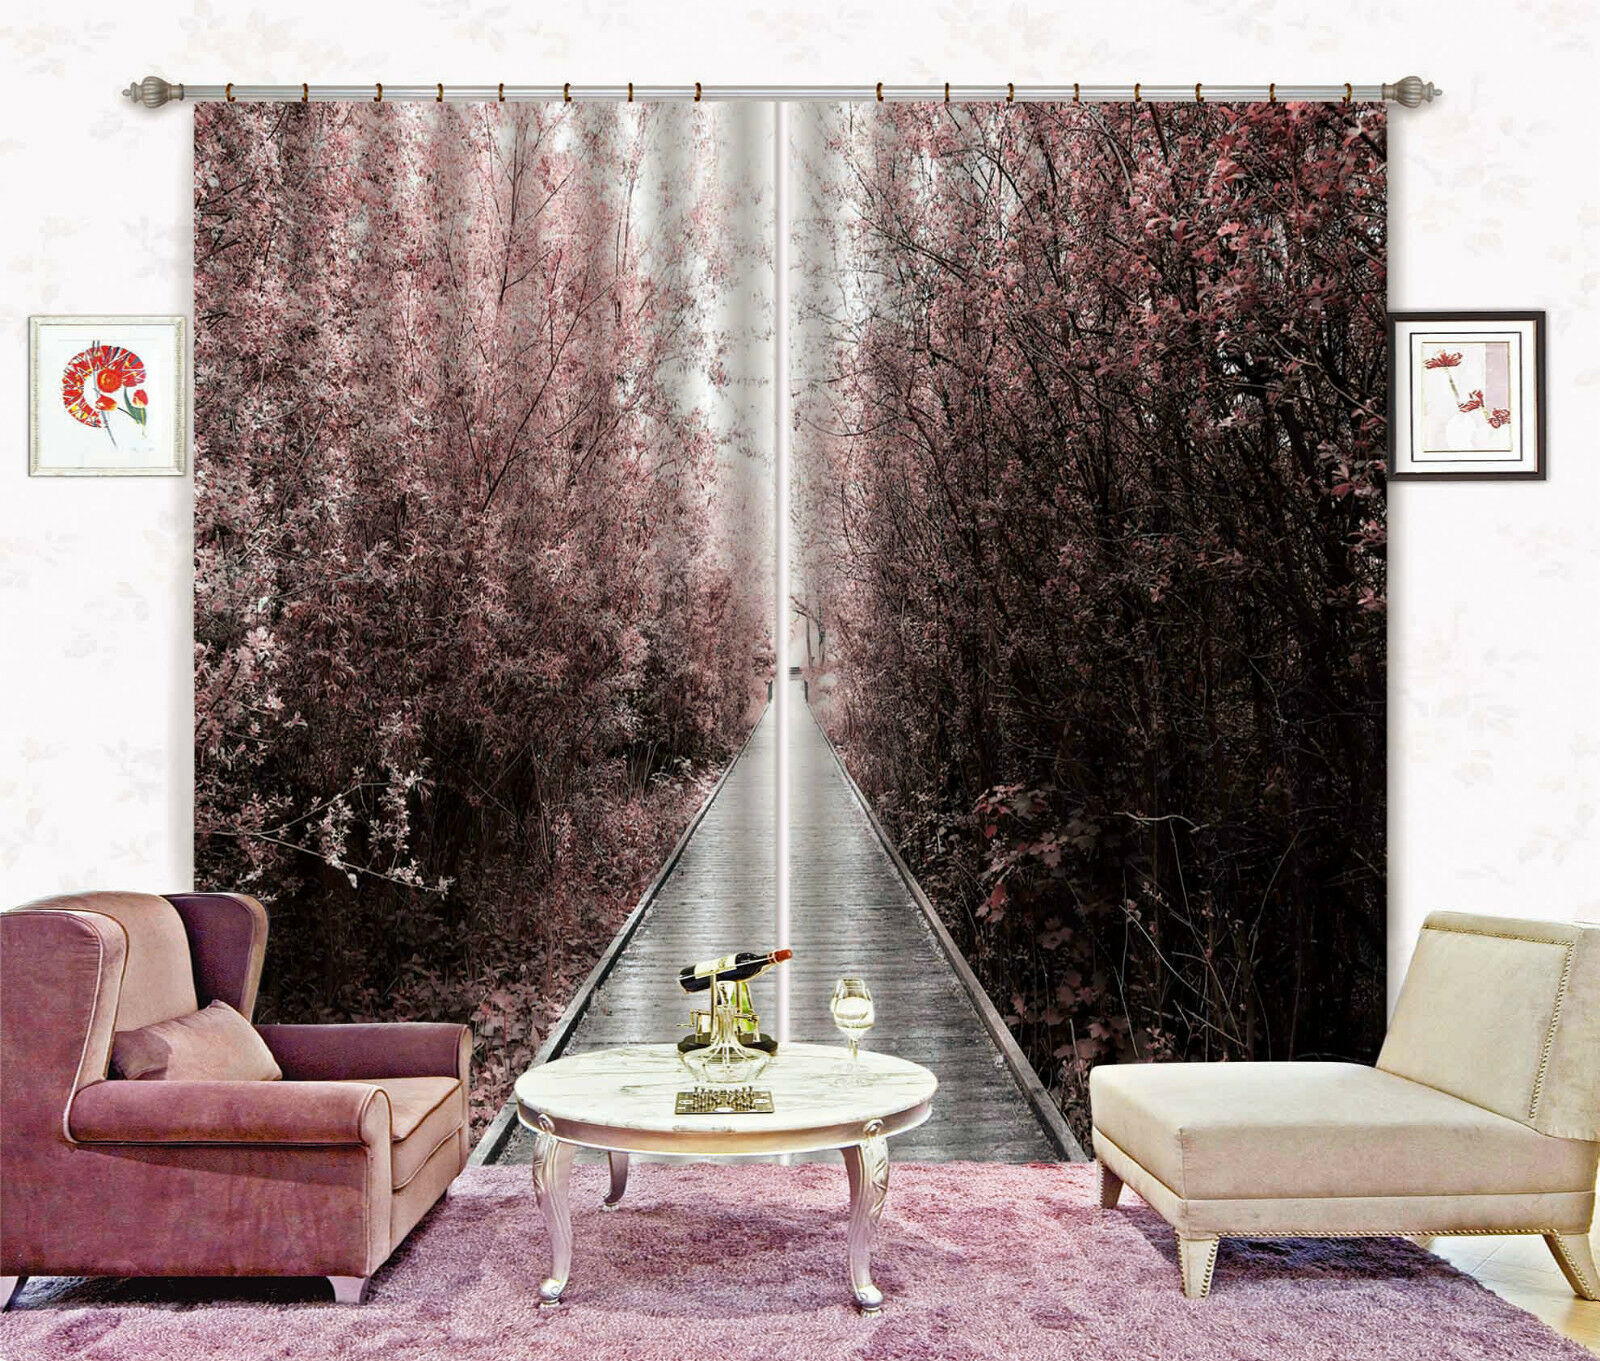 3d árbol pista 4375 bloqueo foto cortina cortina de impresión sustancia cortinas de ventana